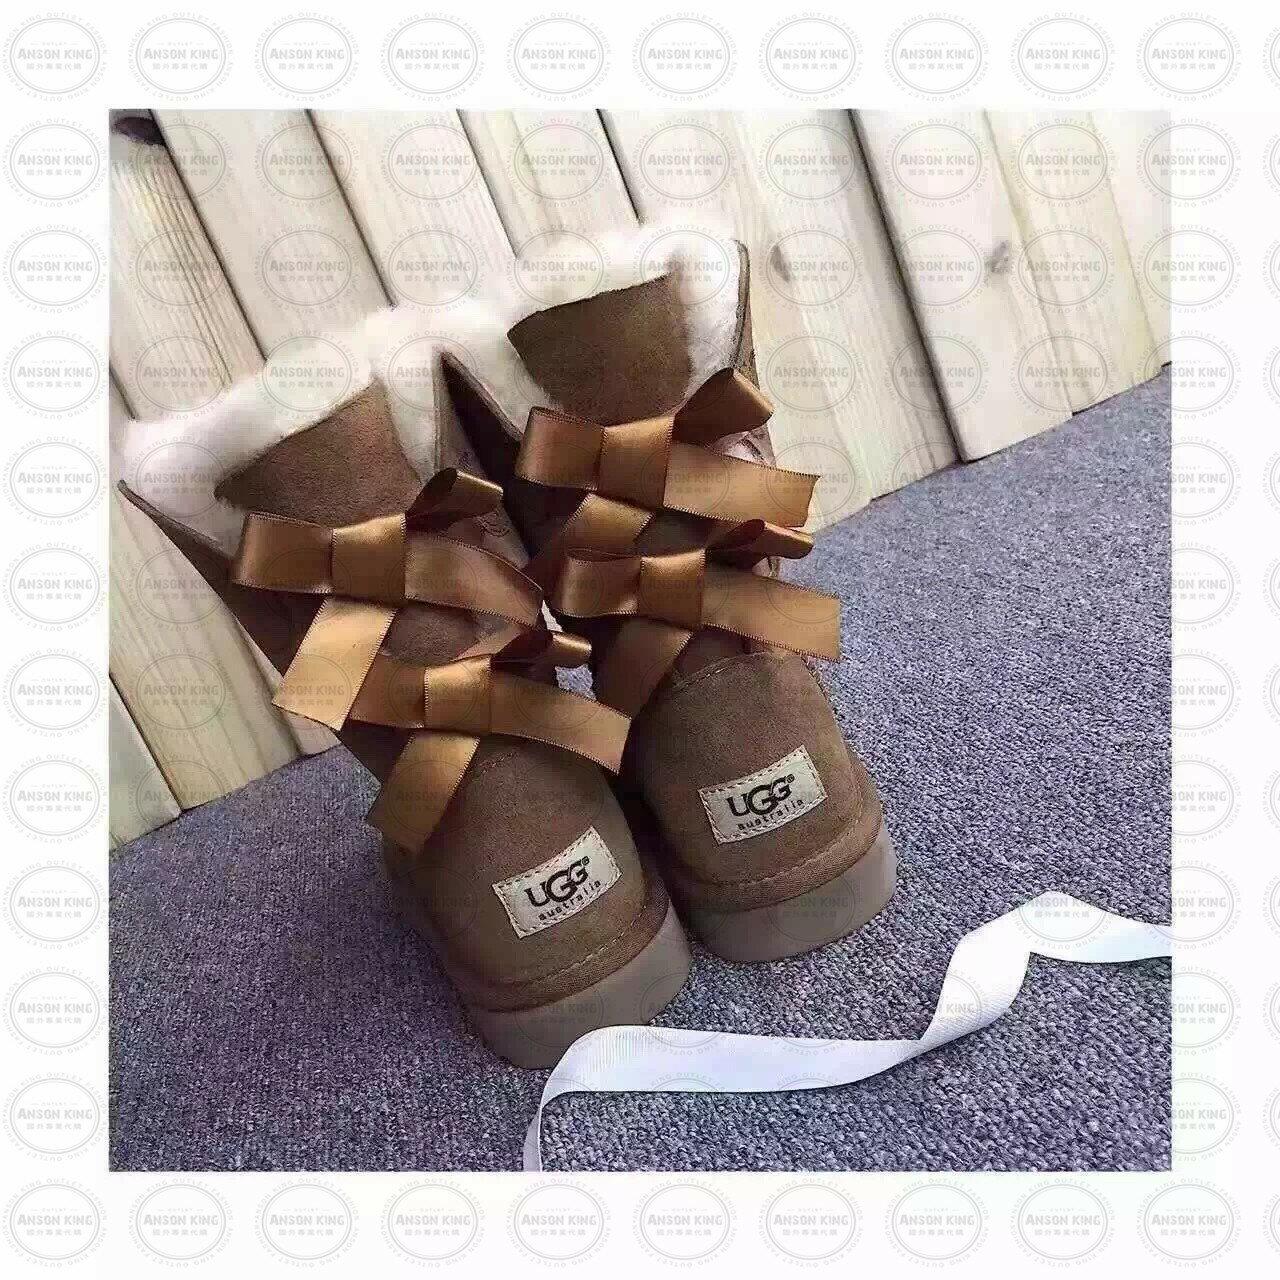 OUTLET正品代購 澳洲 UGG 蝴蝶結3280羊皮毛一體 中長靴 保暖 真皮羊皮毛 雪靴 短靴 駝色 0